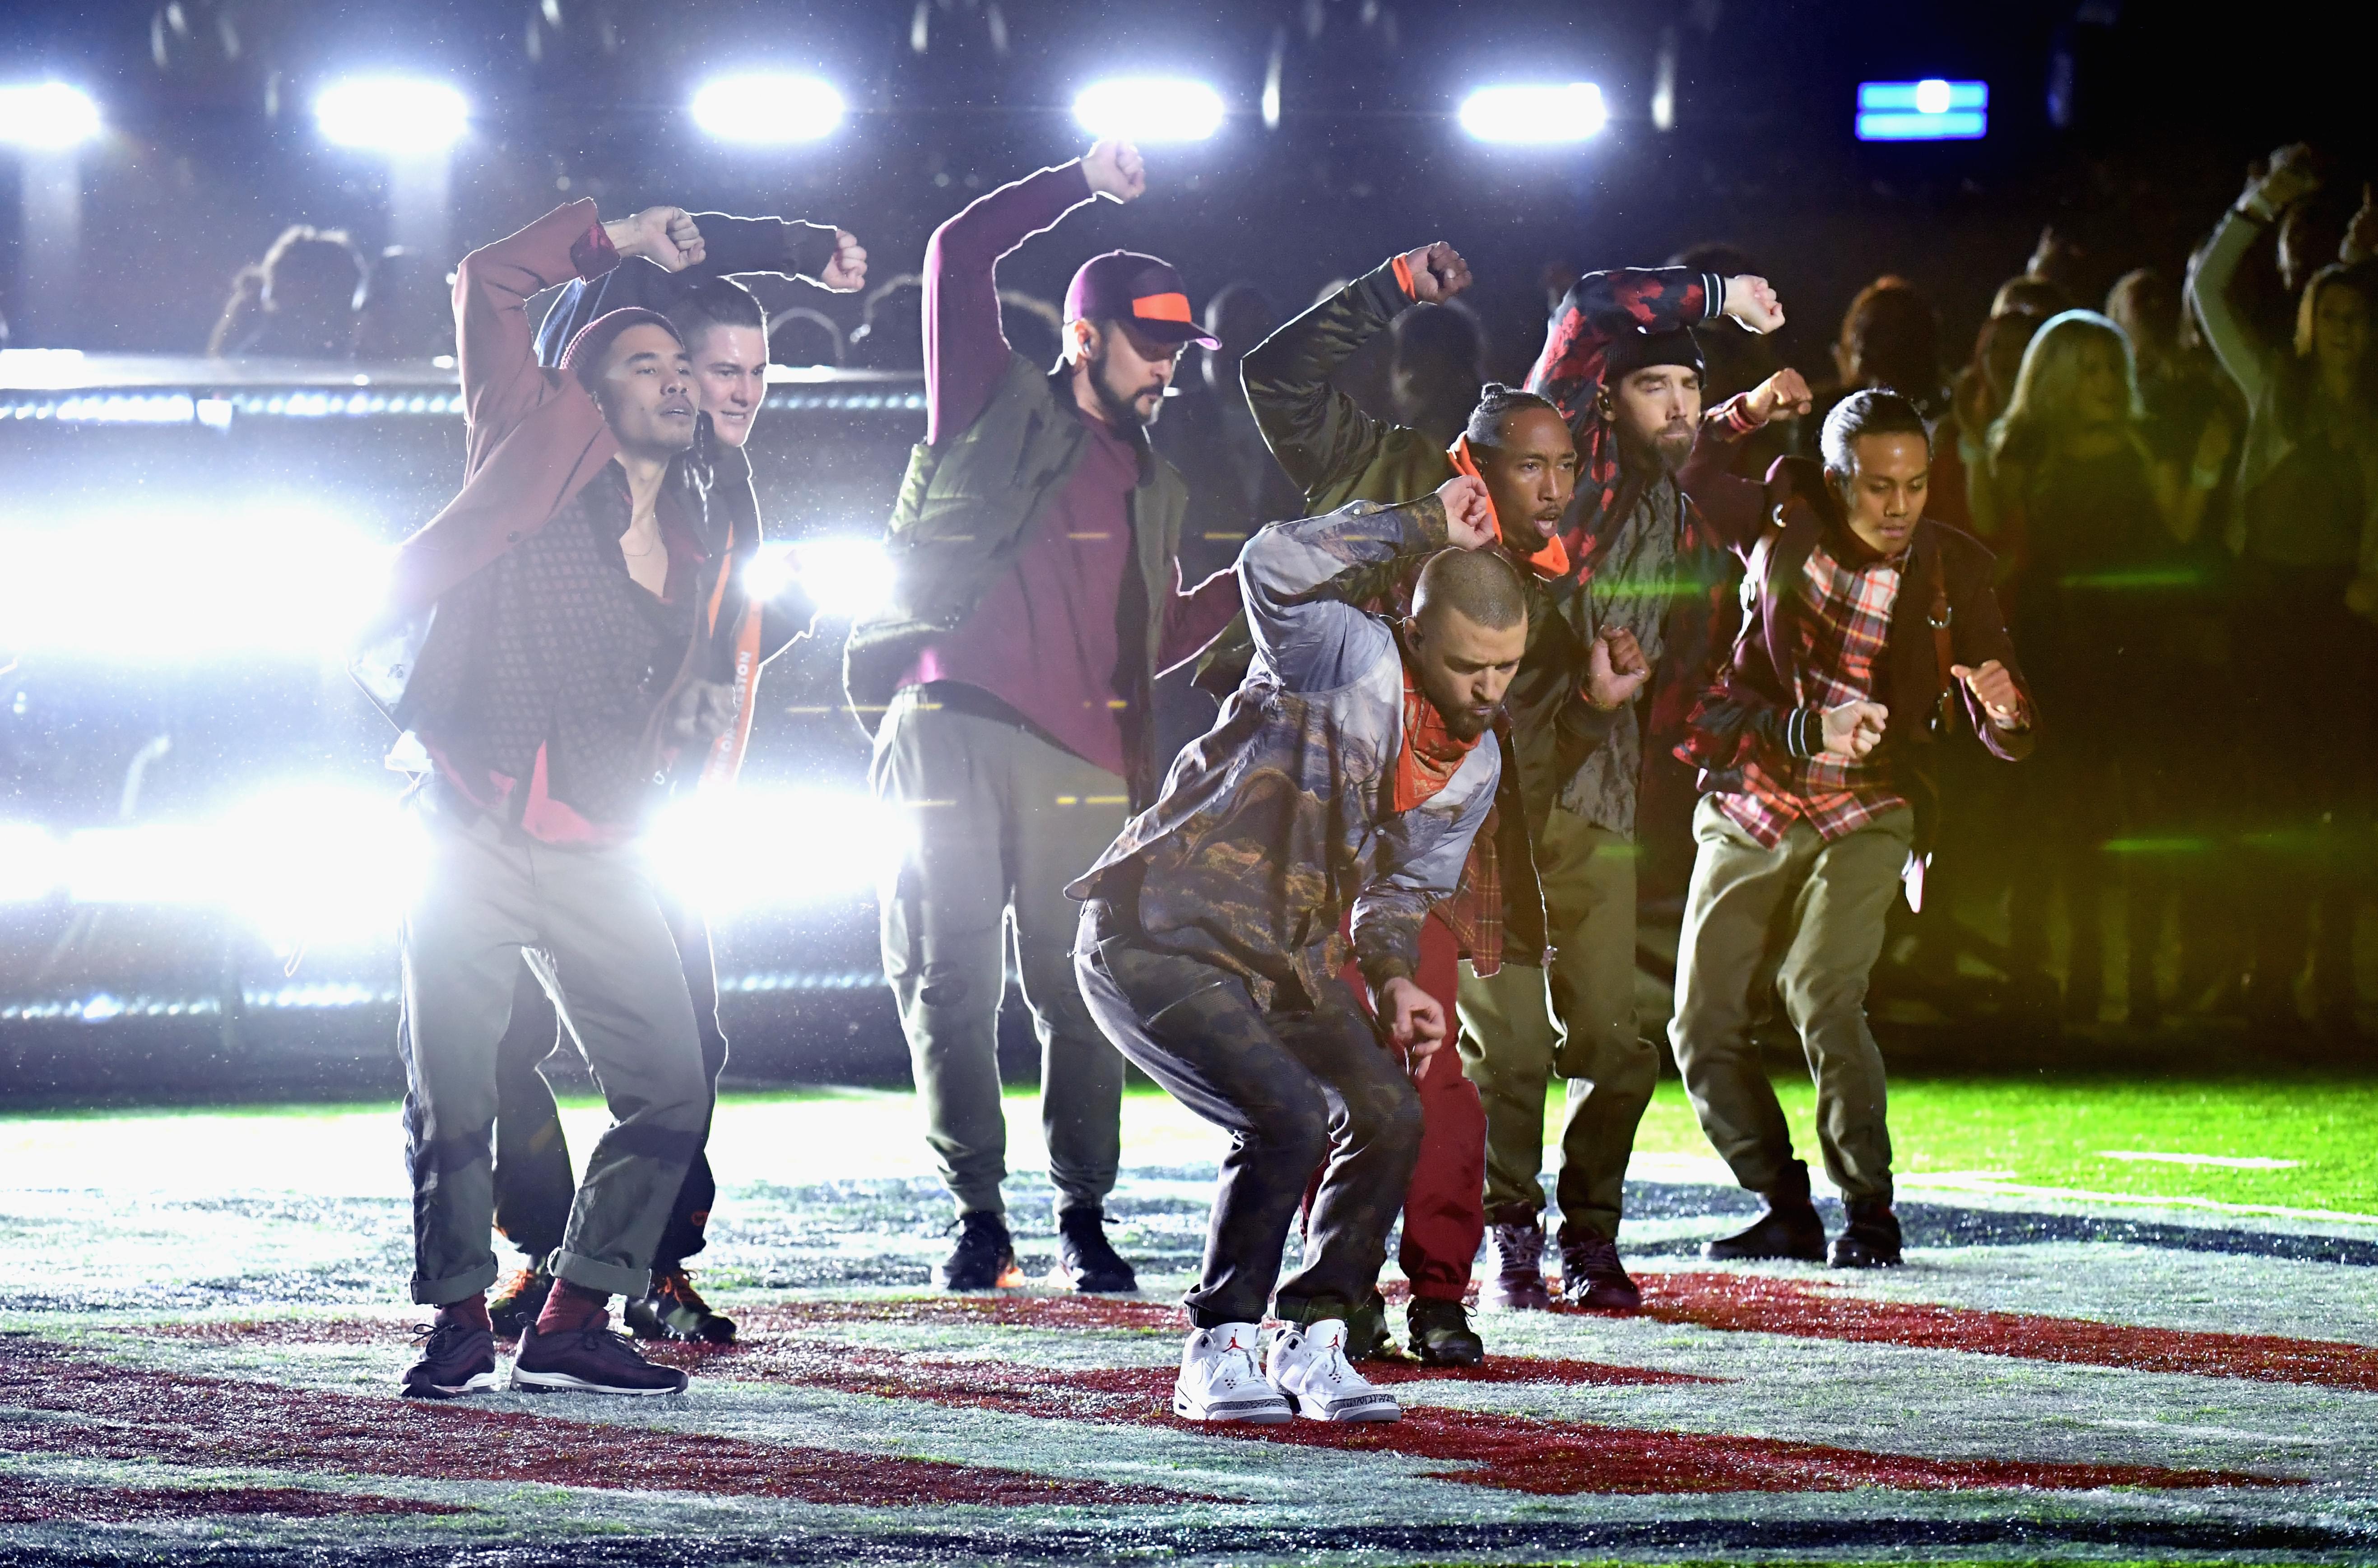 aa44998caee9 Justin Timberlake Air Jordan 3 JTH Super Bowl Sneakers Sold Out ...